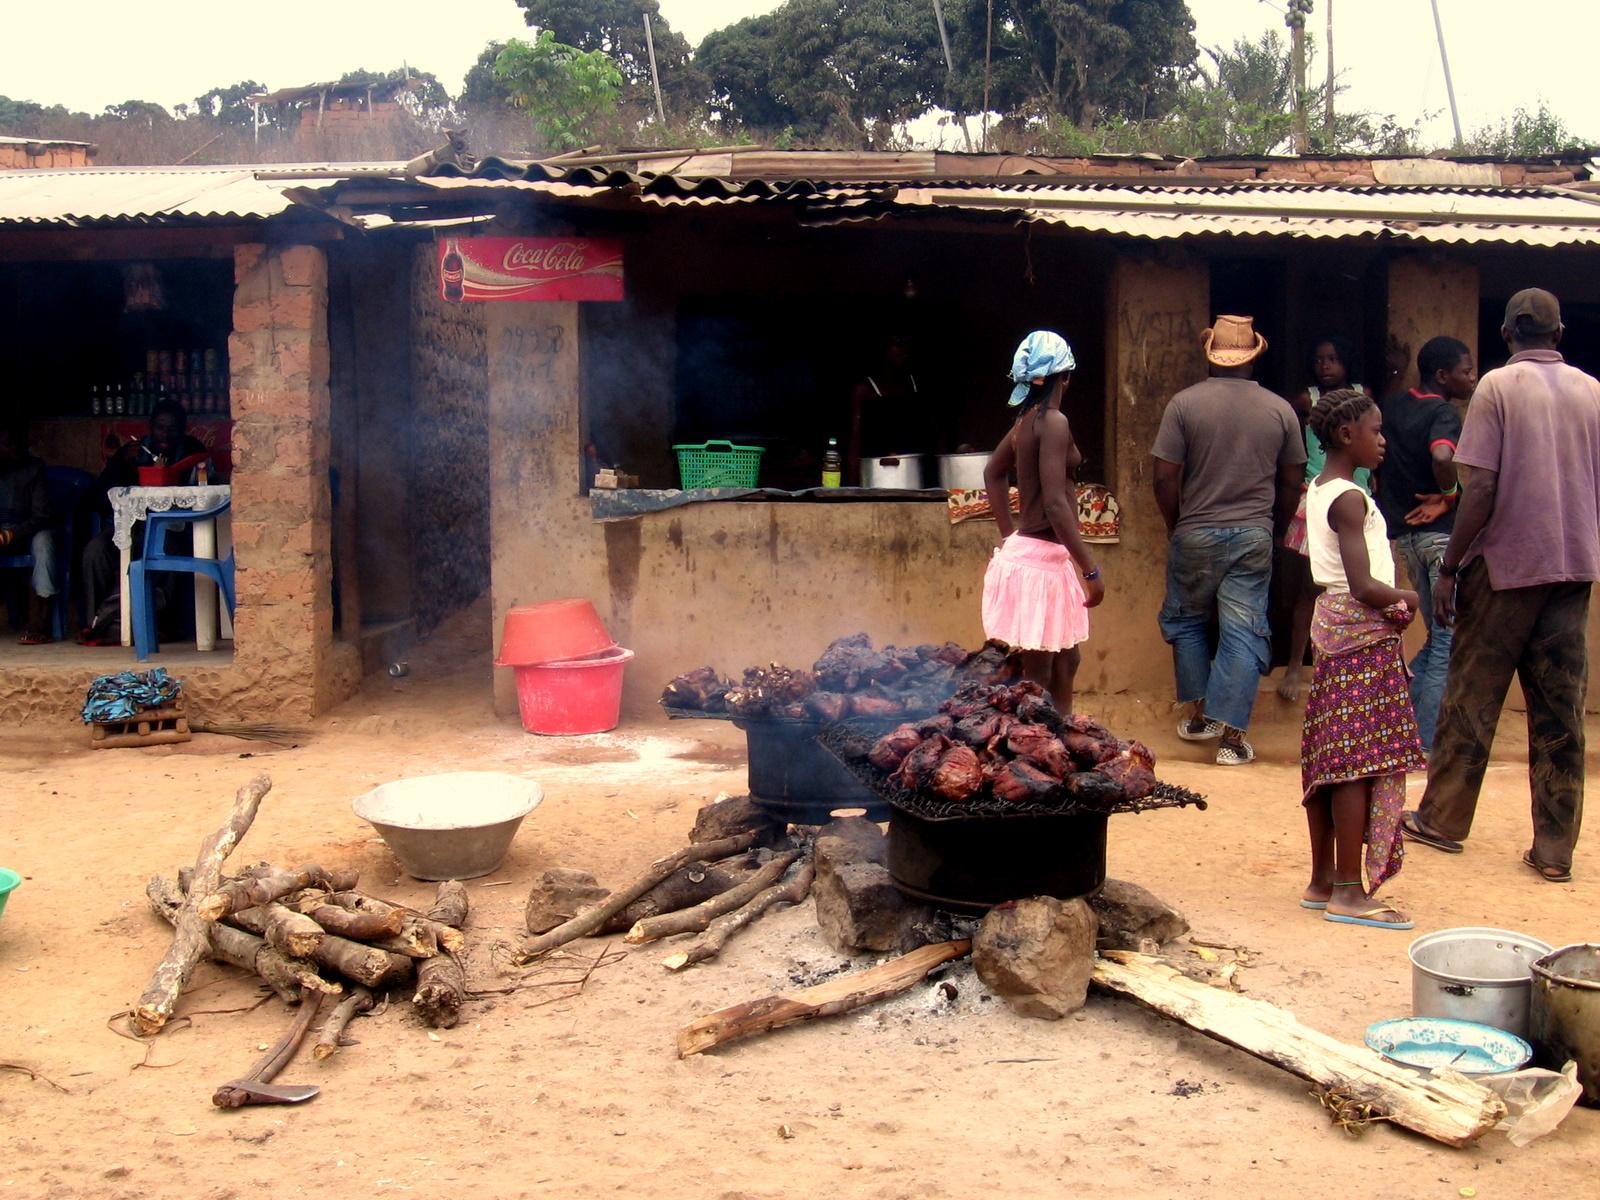 File:Streetscene Angola village.JPG - Wikimedia Commonsangola village